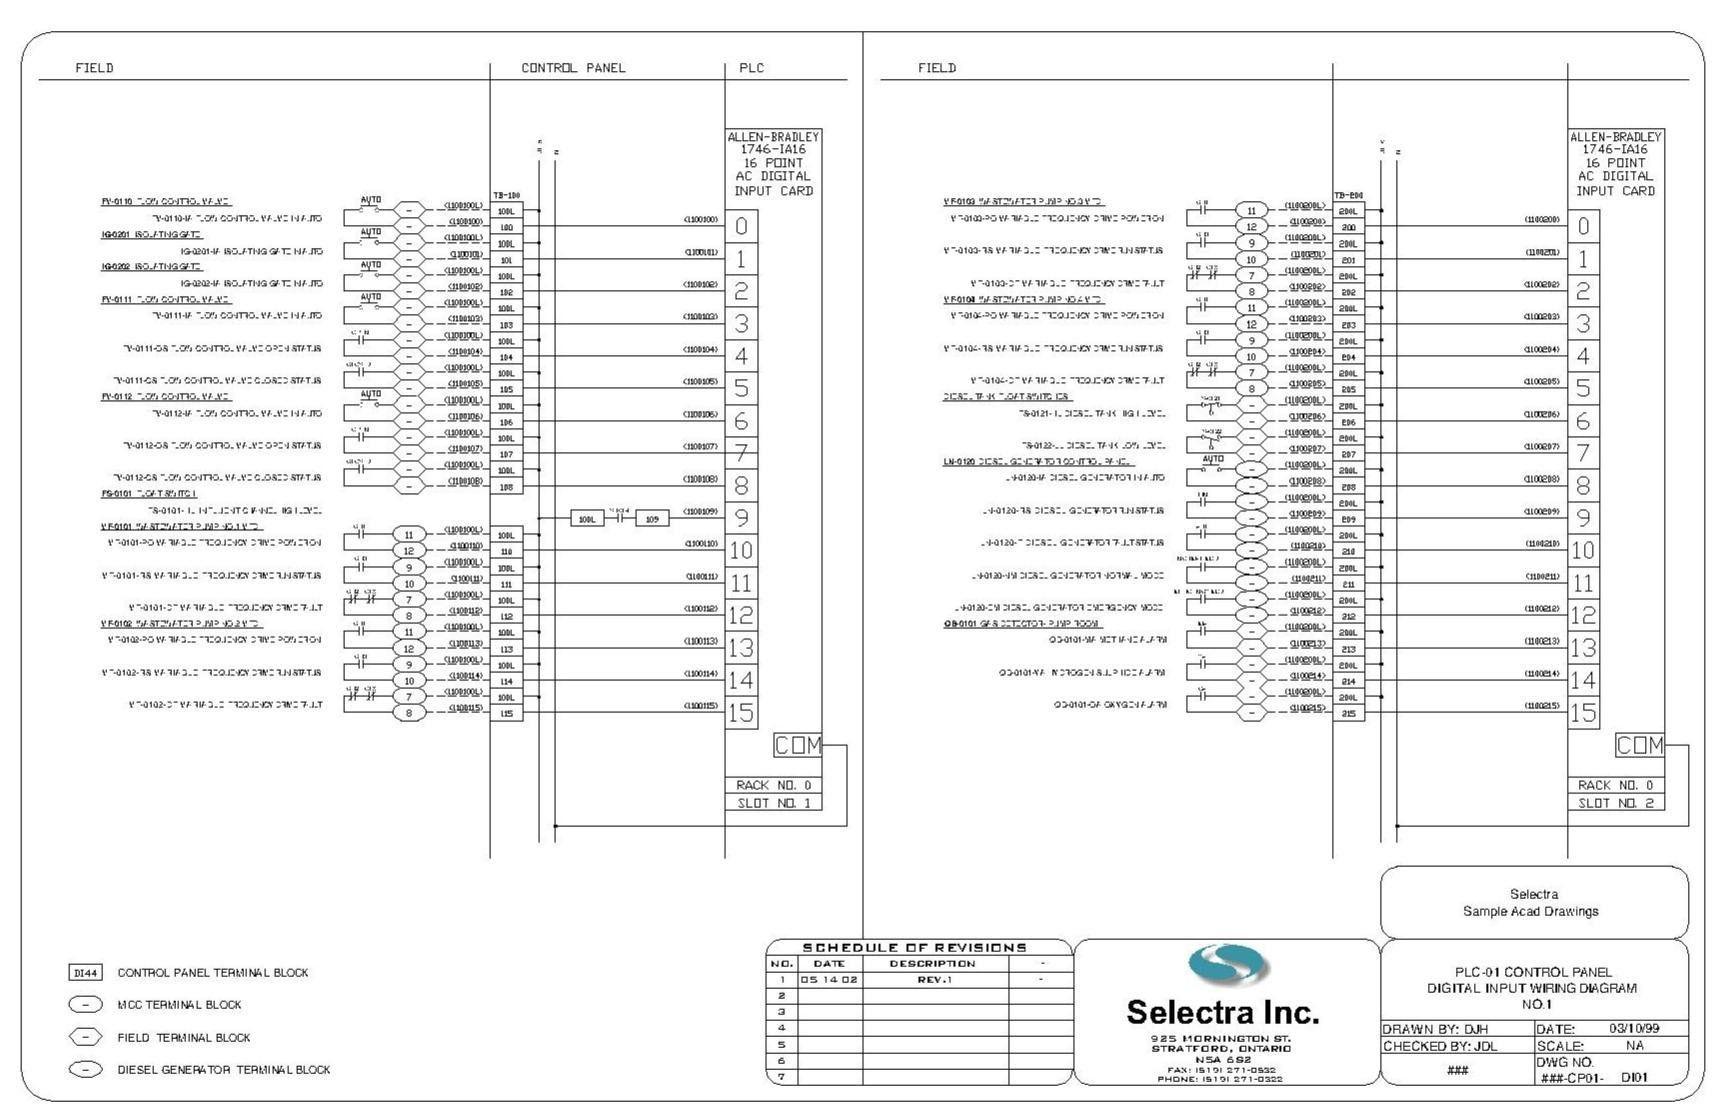 Unique Lovato Contactor Wiring Diagram Bullet Journal Diagram Wire